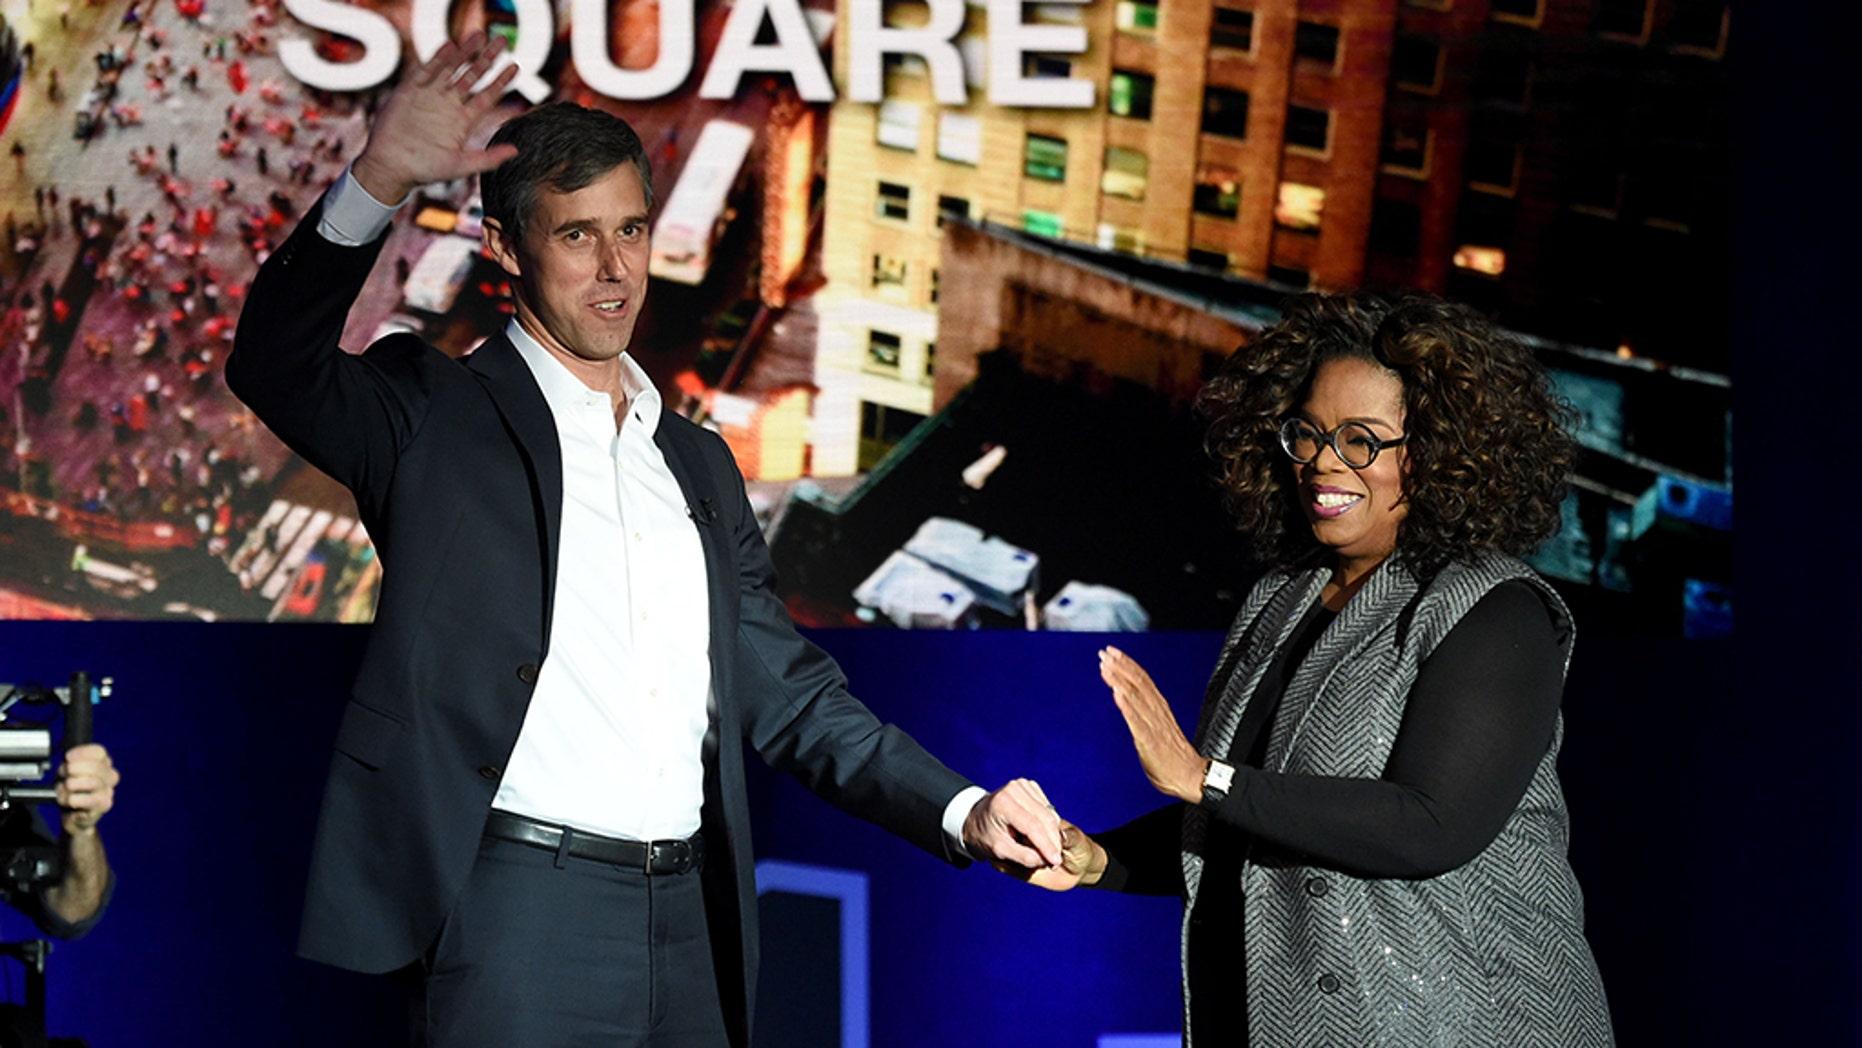 In an interview Tuesday, Oprah Winfrey encouraged Democrat Beto O'Rourke to seek the presidency. (Jamie McCarthy/Getty)